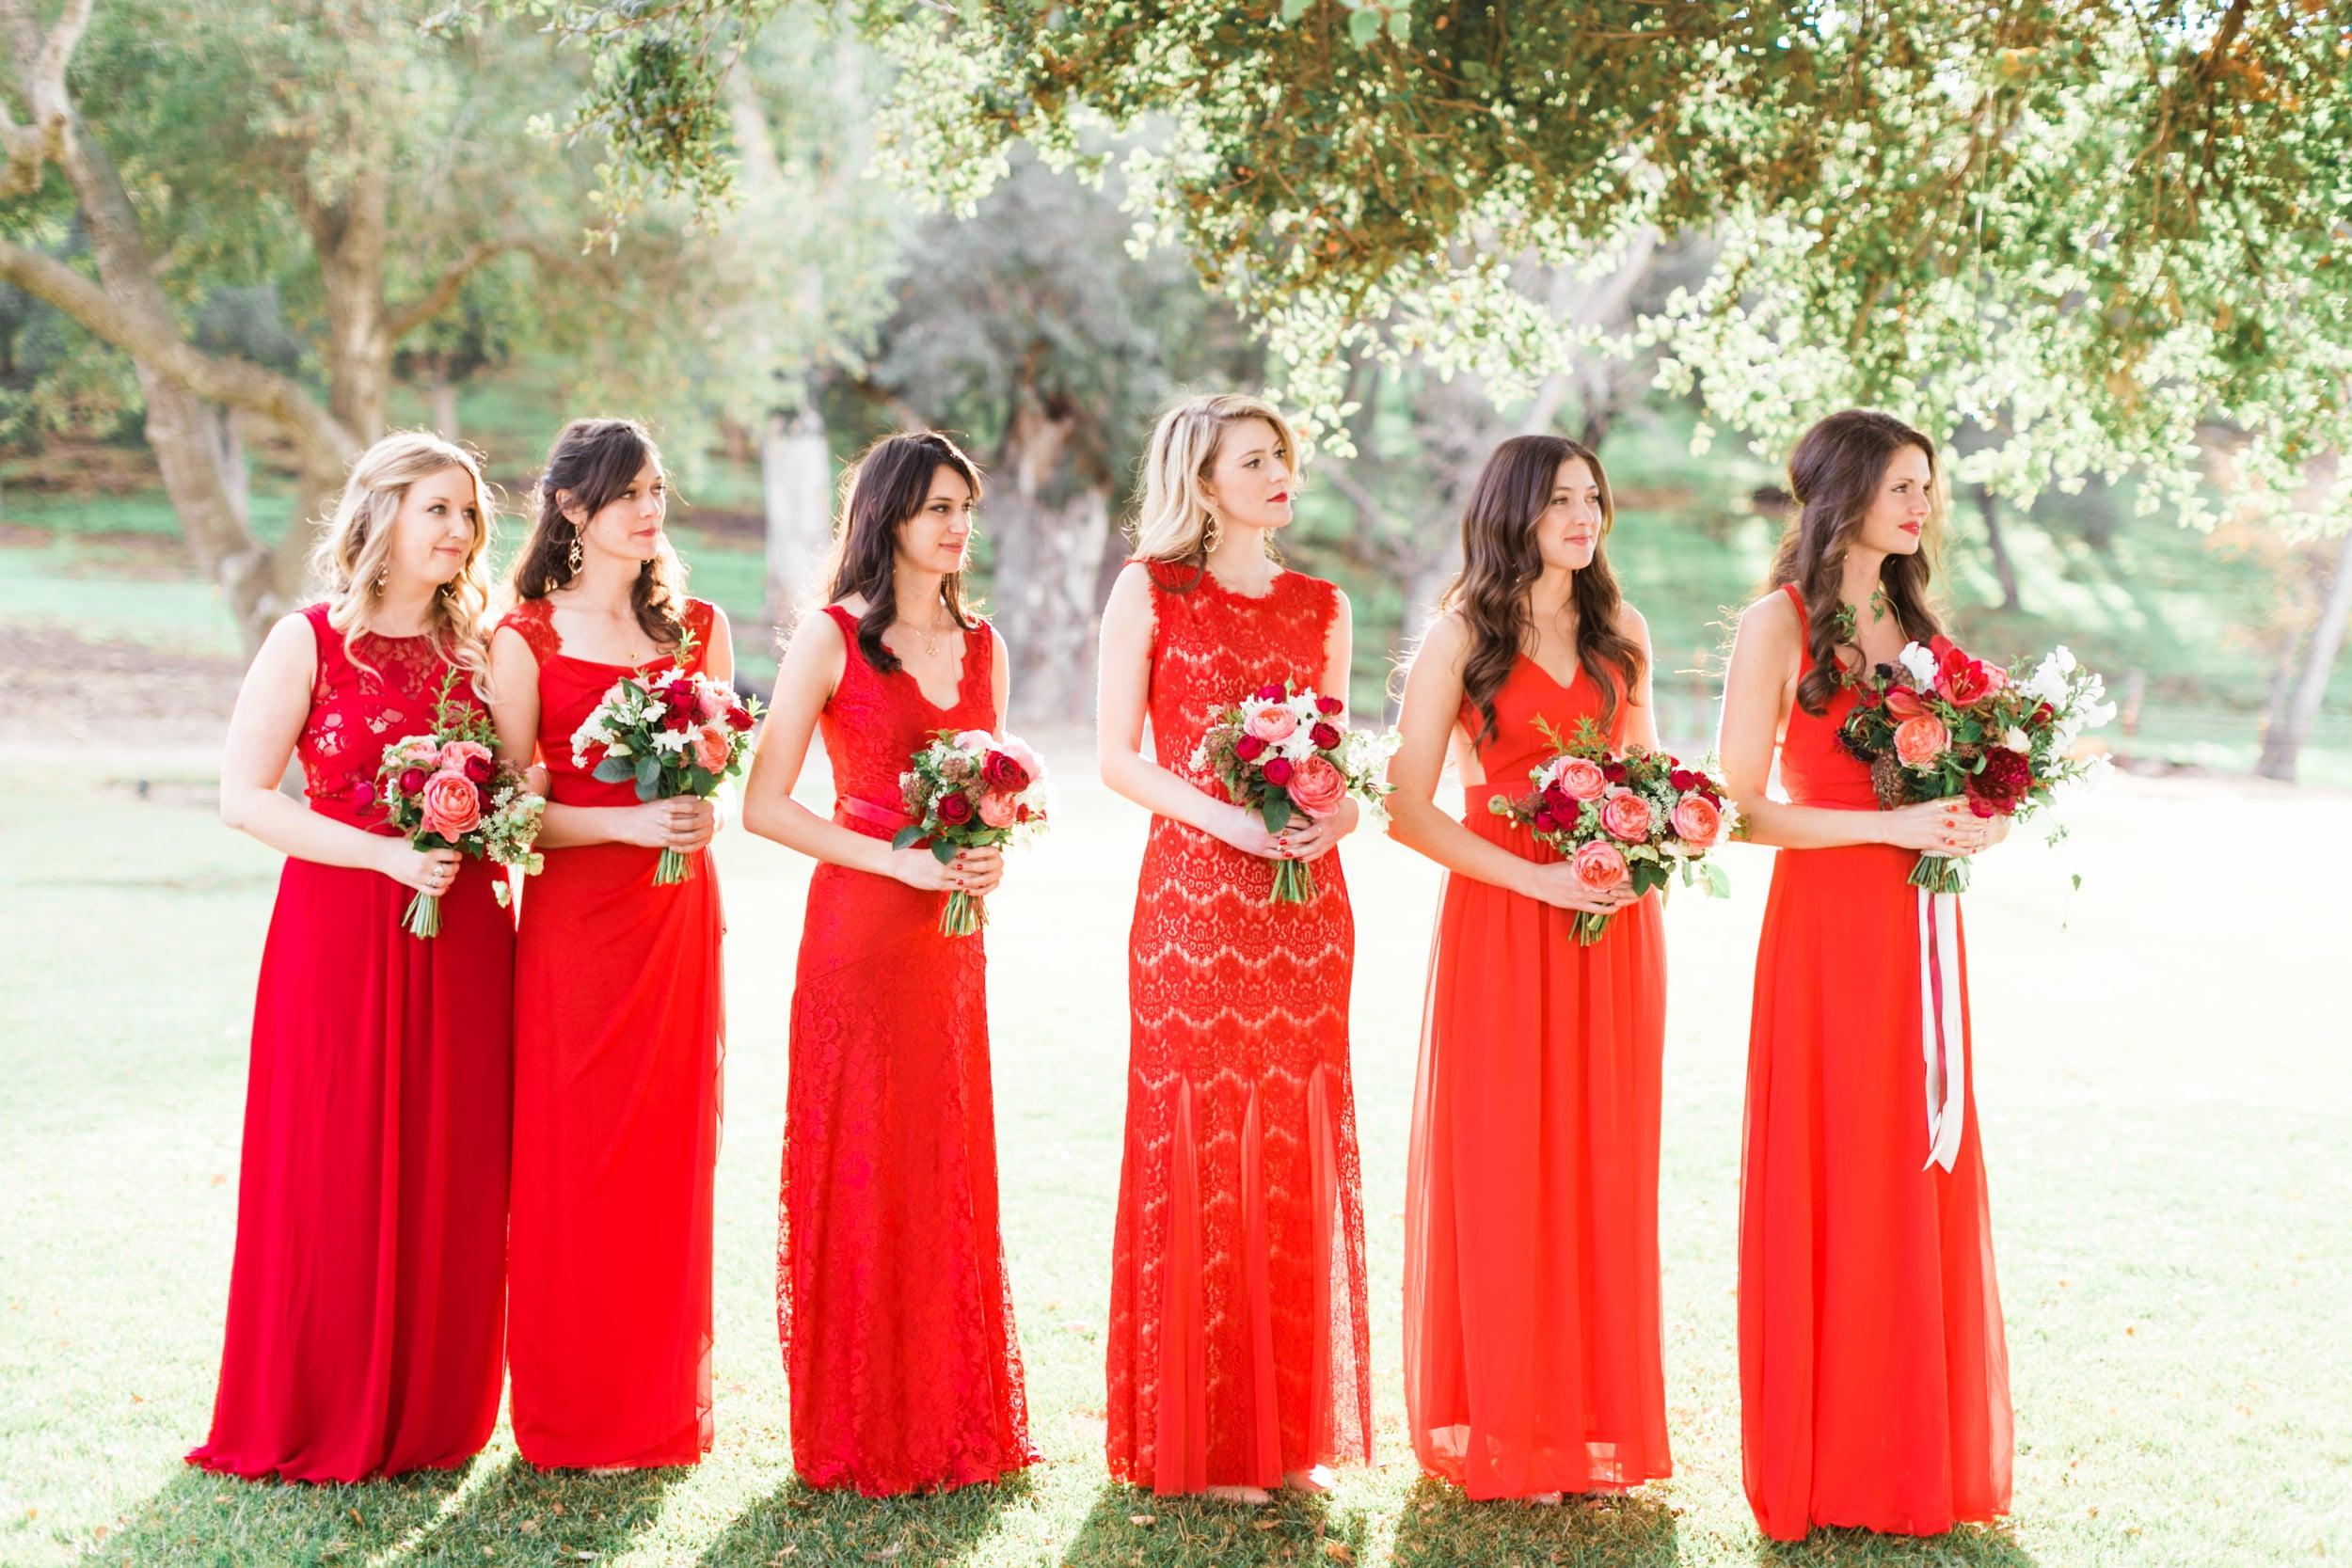 Natalie_Schutt_Photography_Winter_Wedding_San_Luis_Obispo-116.jpg